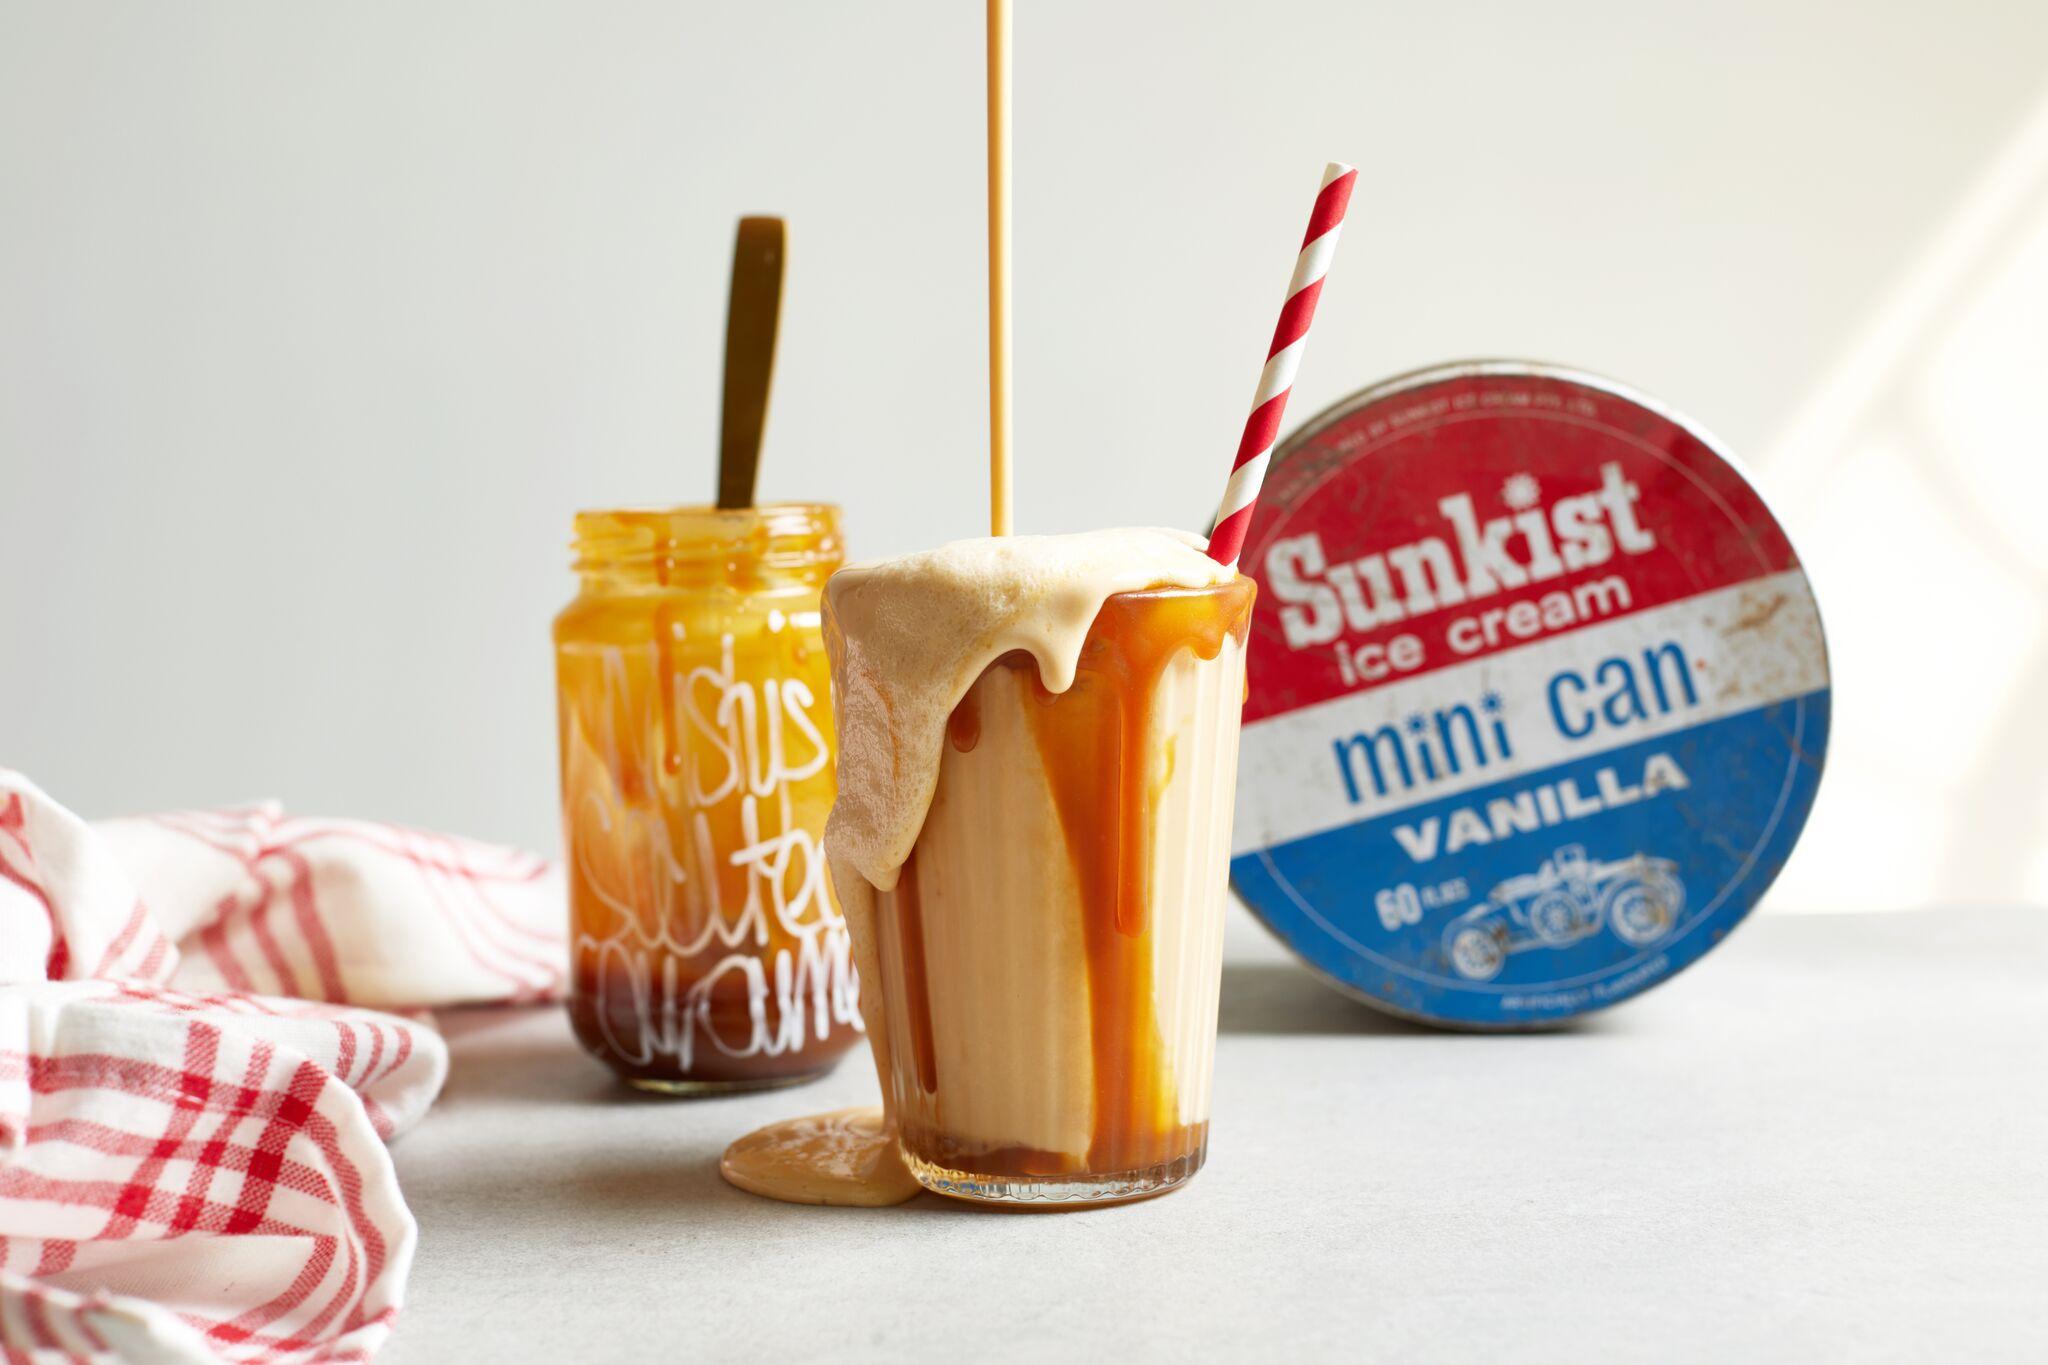 Misty's Salted Caramel - Milkshake